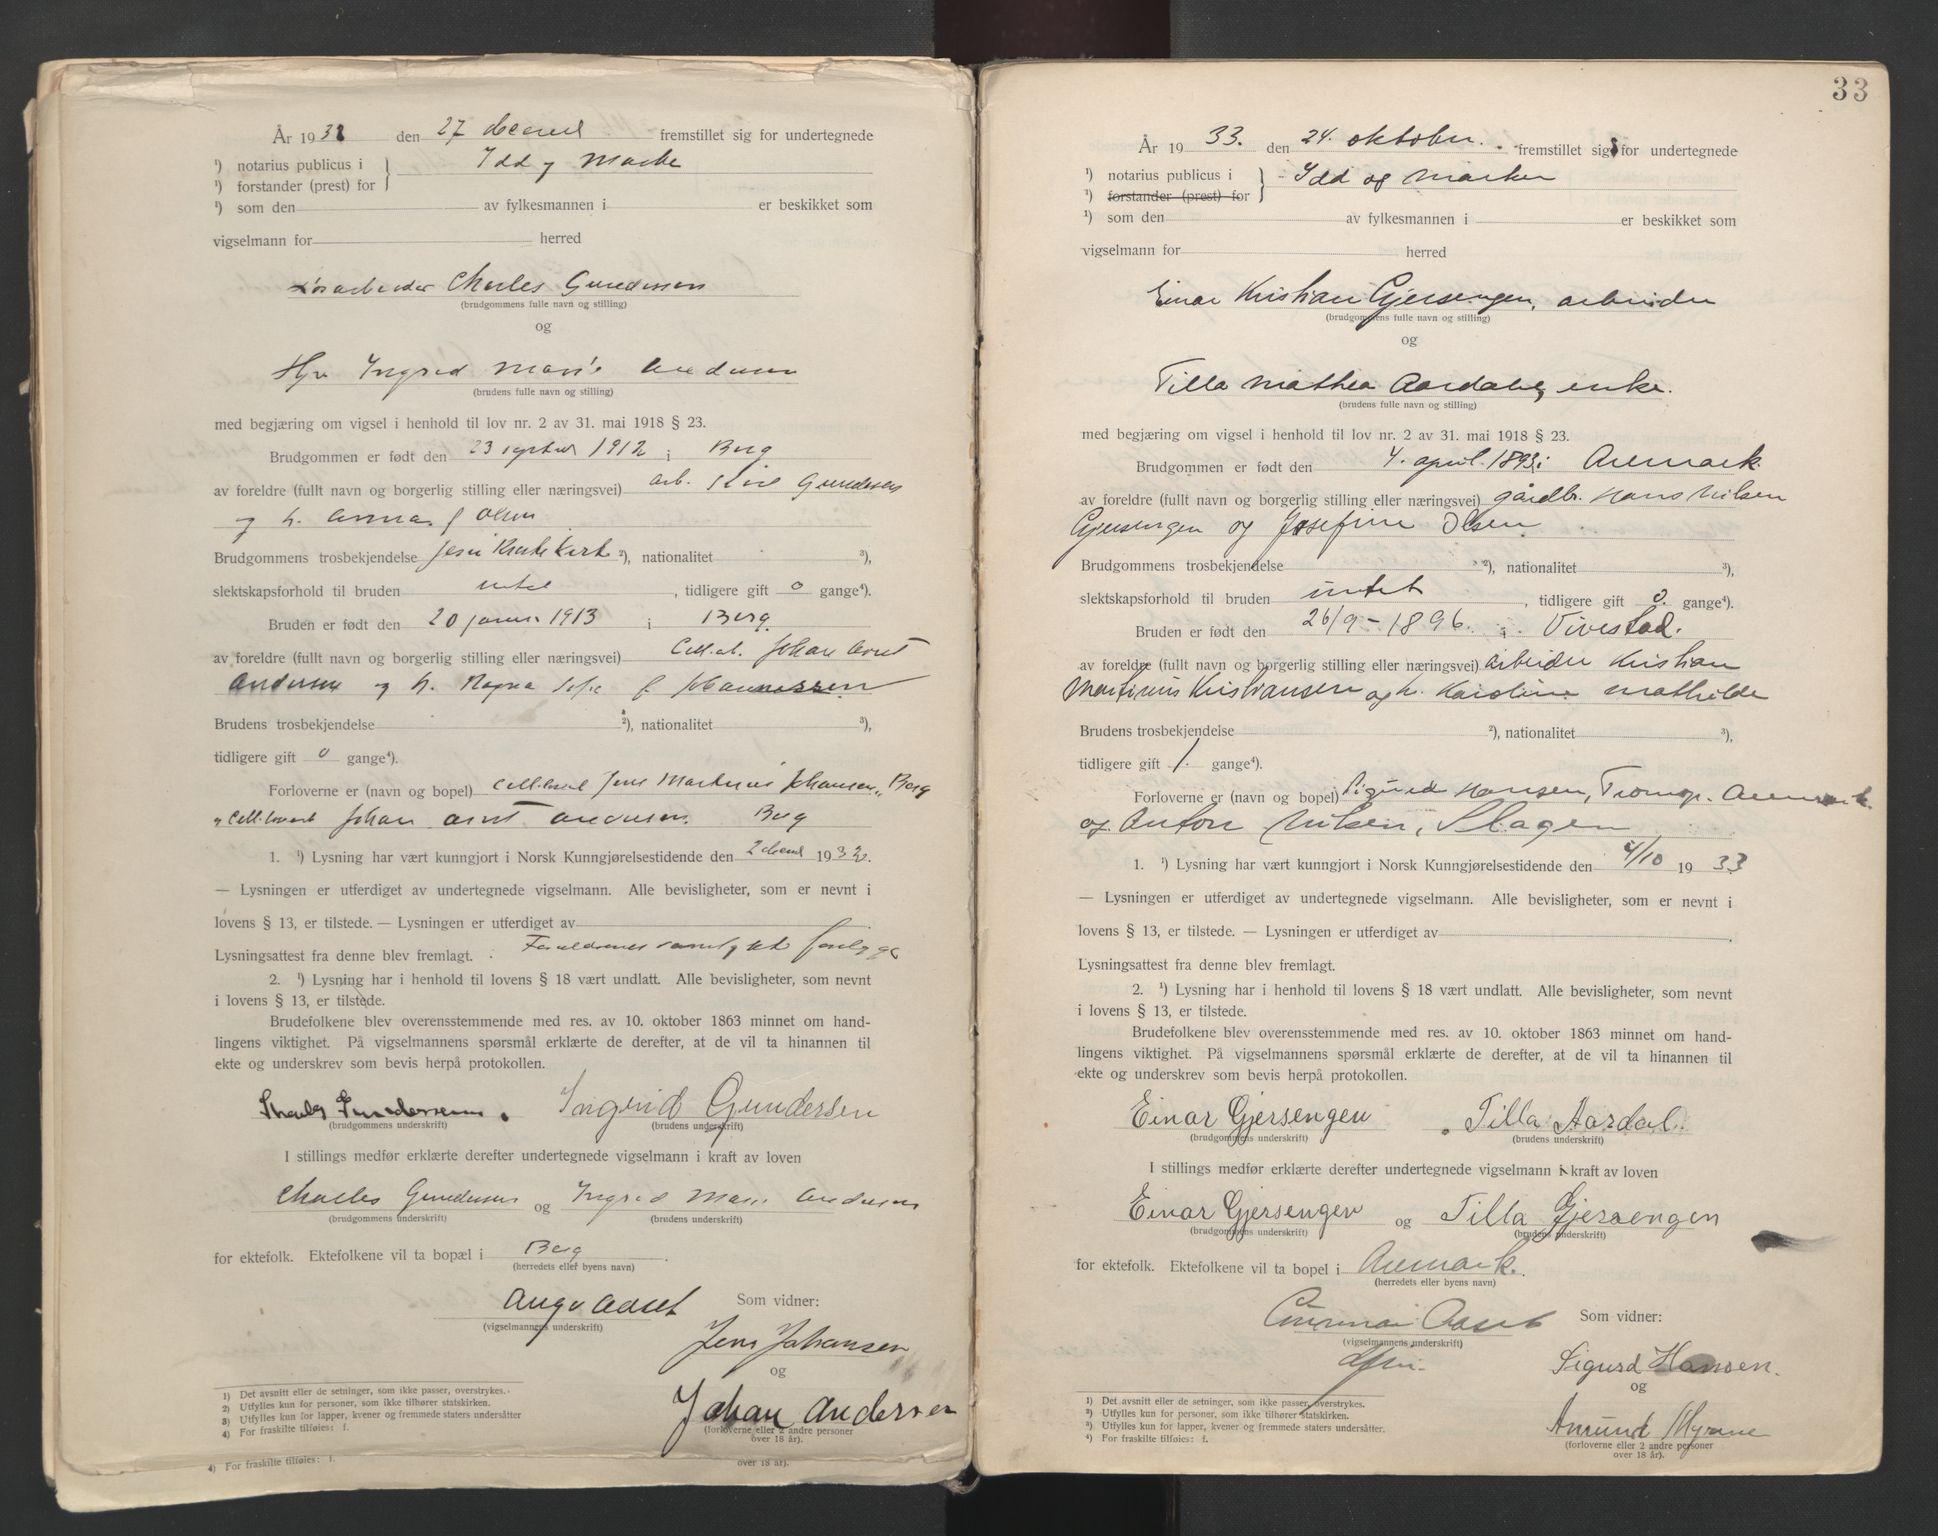 SAO, Idd og Marker sorenskriveri, L/Lc/L0001: Vigselsbøker, 1920-1942, s. 33